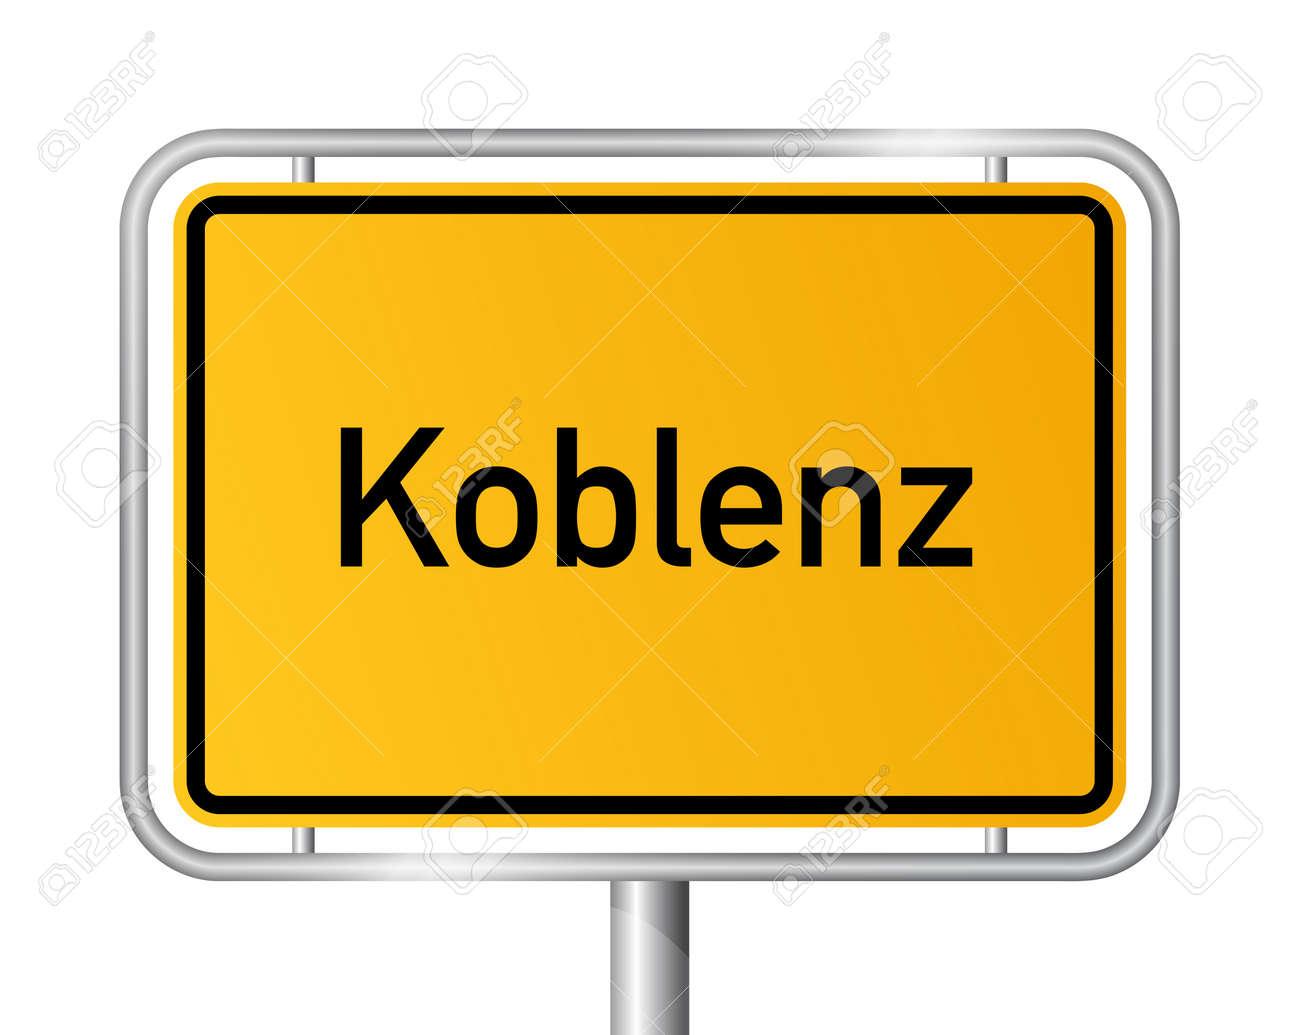 City limit sign Koblenz against white background - signage Coblenz - Rhineland Palatinate, Rheinland Pfalz, Germany Stock Vector - 17897944